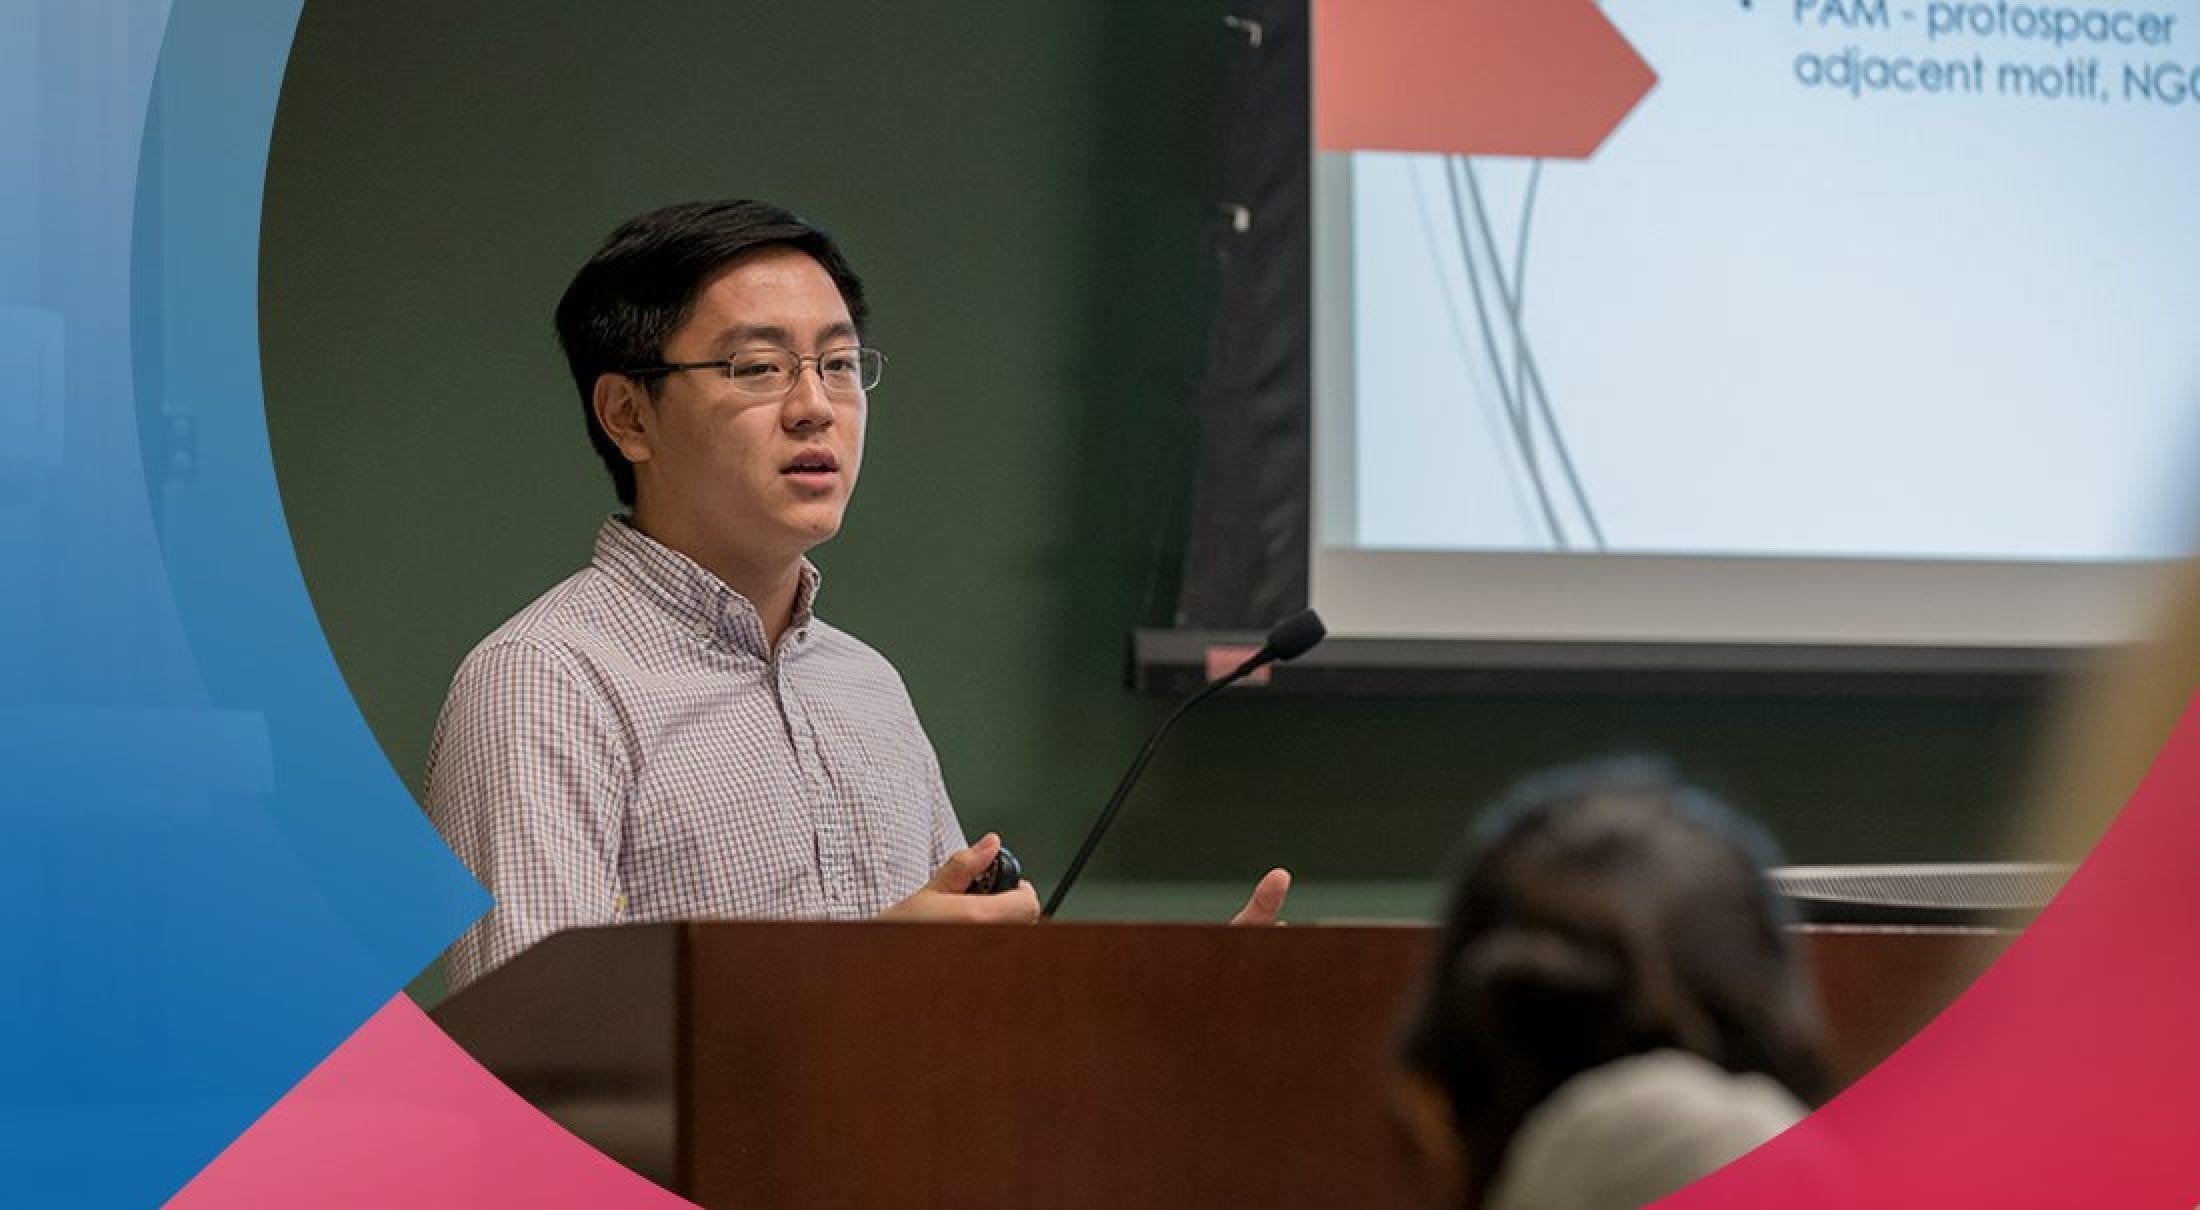 Student researcher Benjamin H. Chi is SMU's first Schwarzman Scholar.